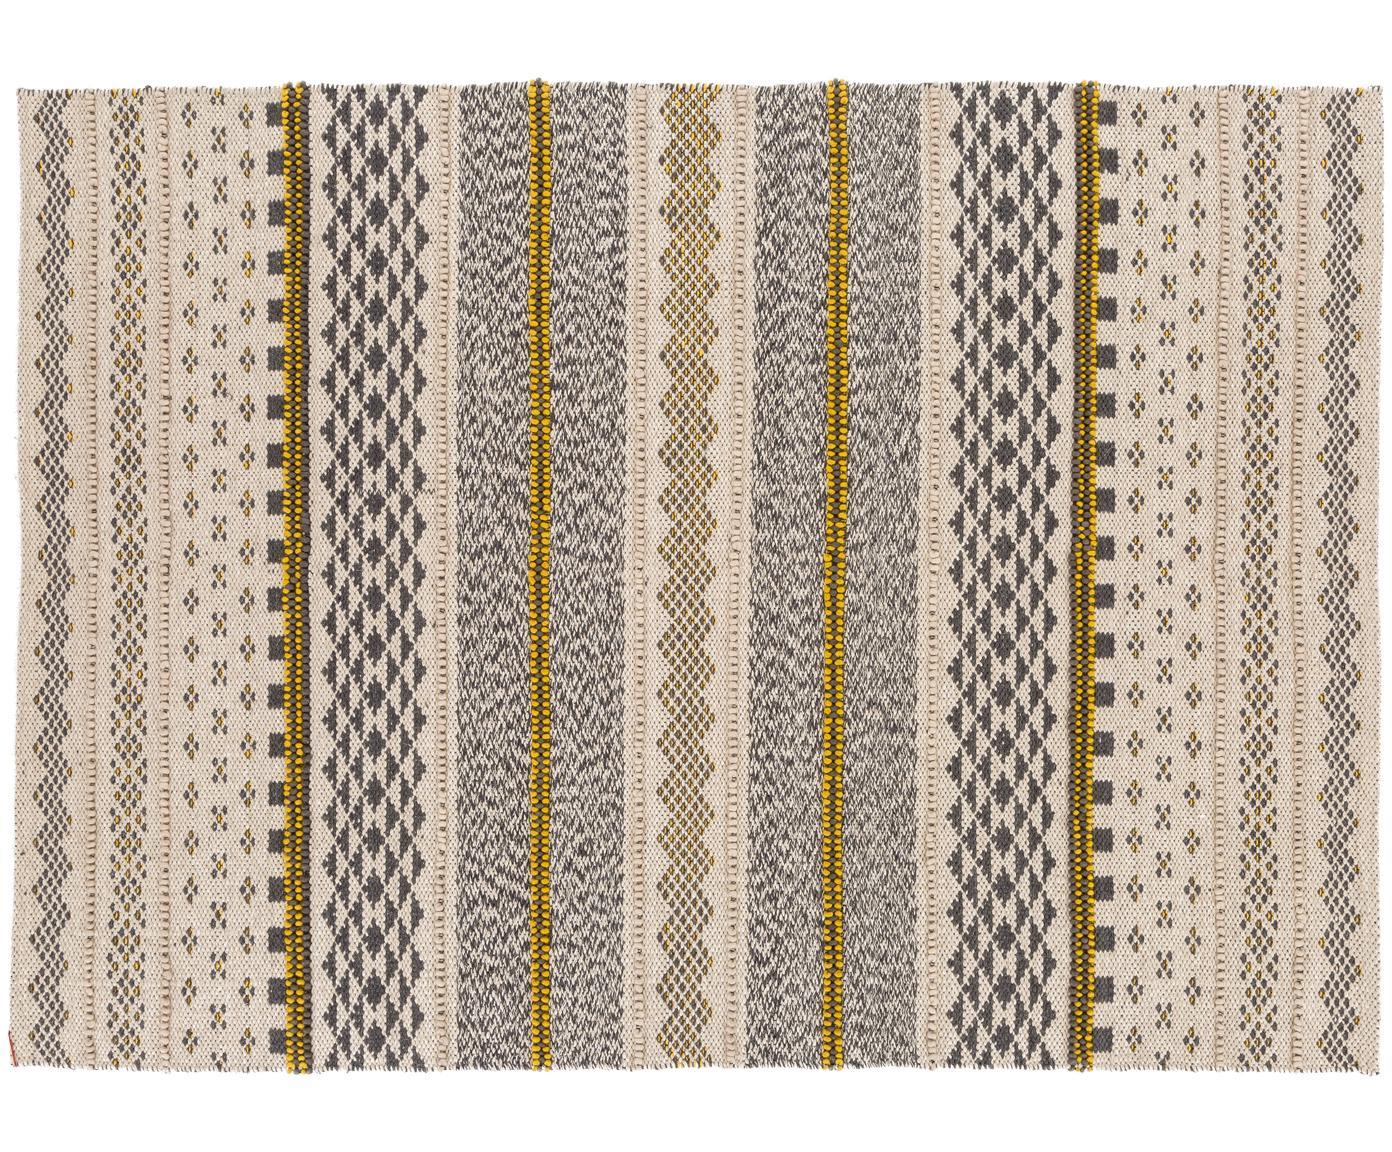 Alfombra de lana Nova, estilo étnico, Gris, mostaza, beige, An 140 x L 200 cm (Tamaño S)